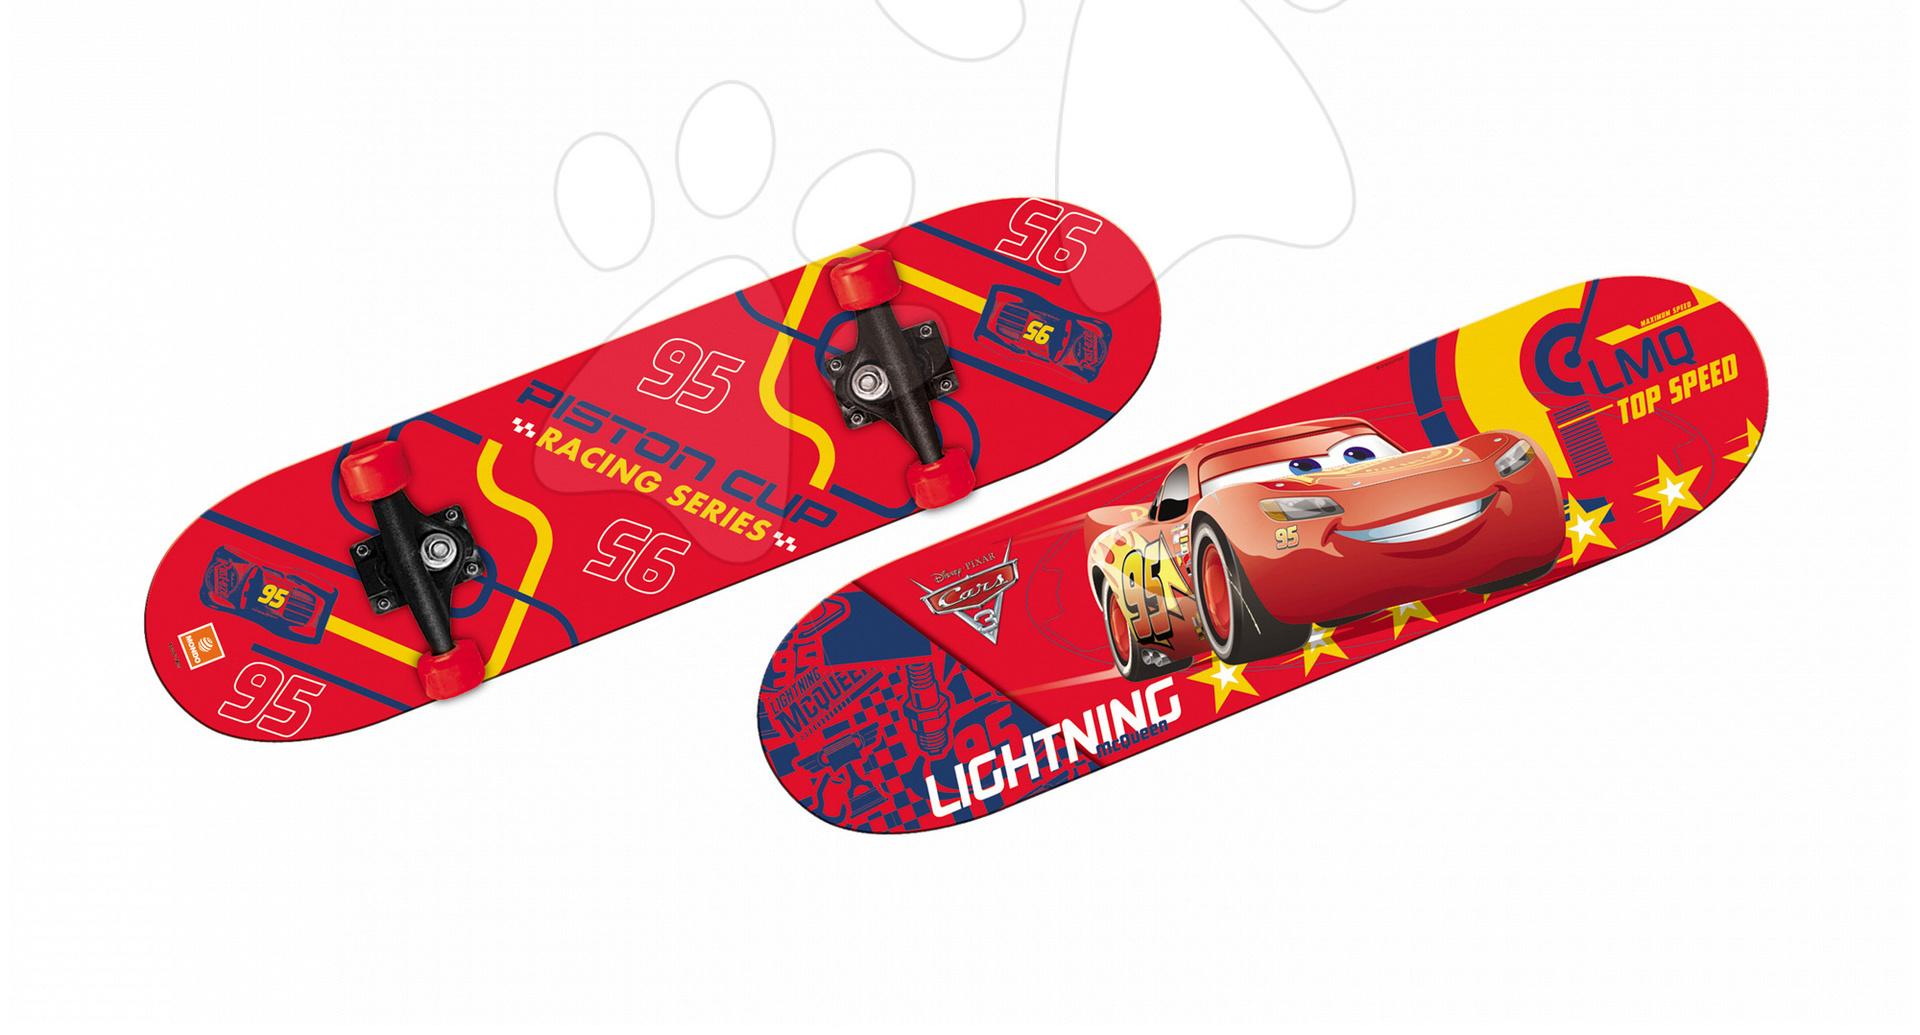 Detské skateboardy - Skateboard Autá Mondo s PVC kolieskami